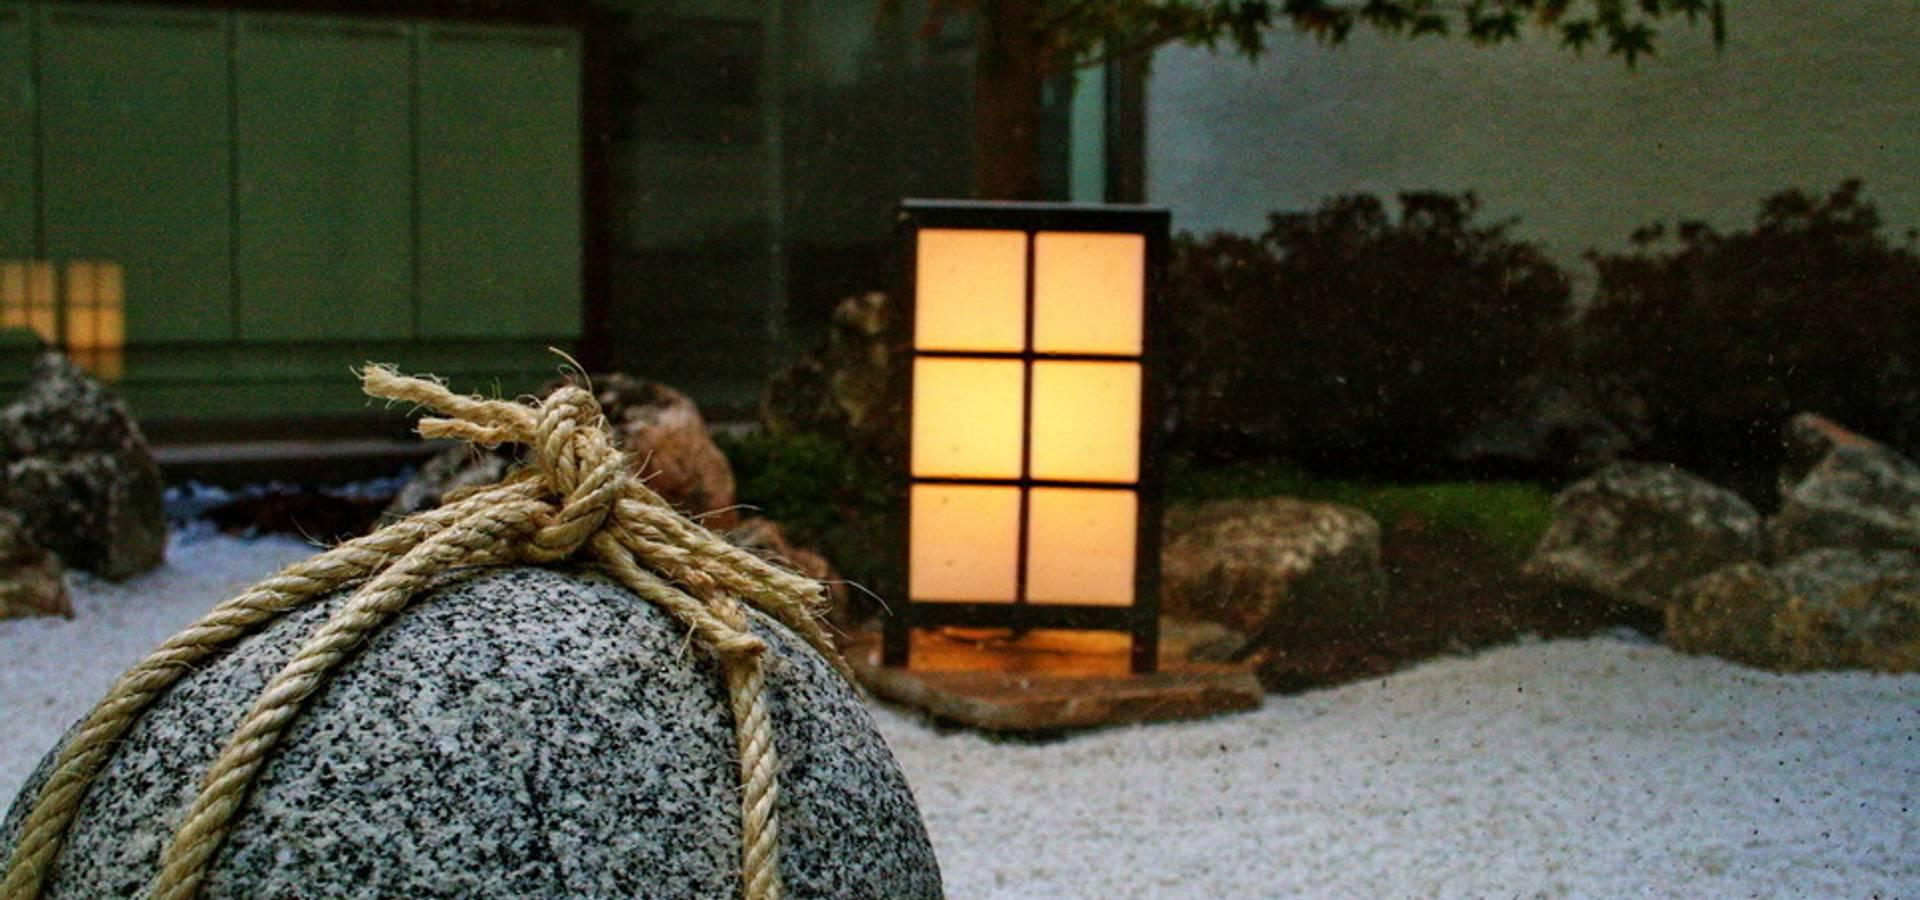 Jardines Japoneses -- Estudio de Paisajismo